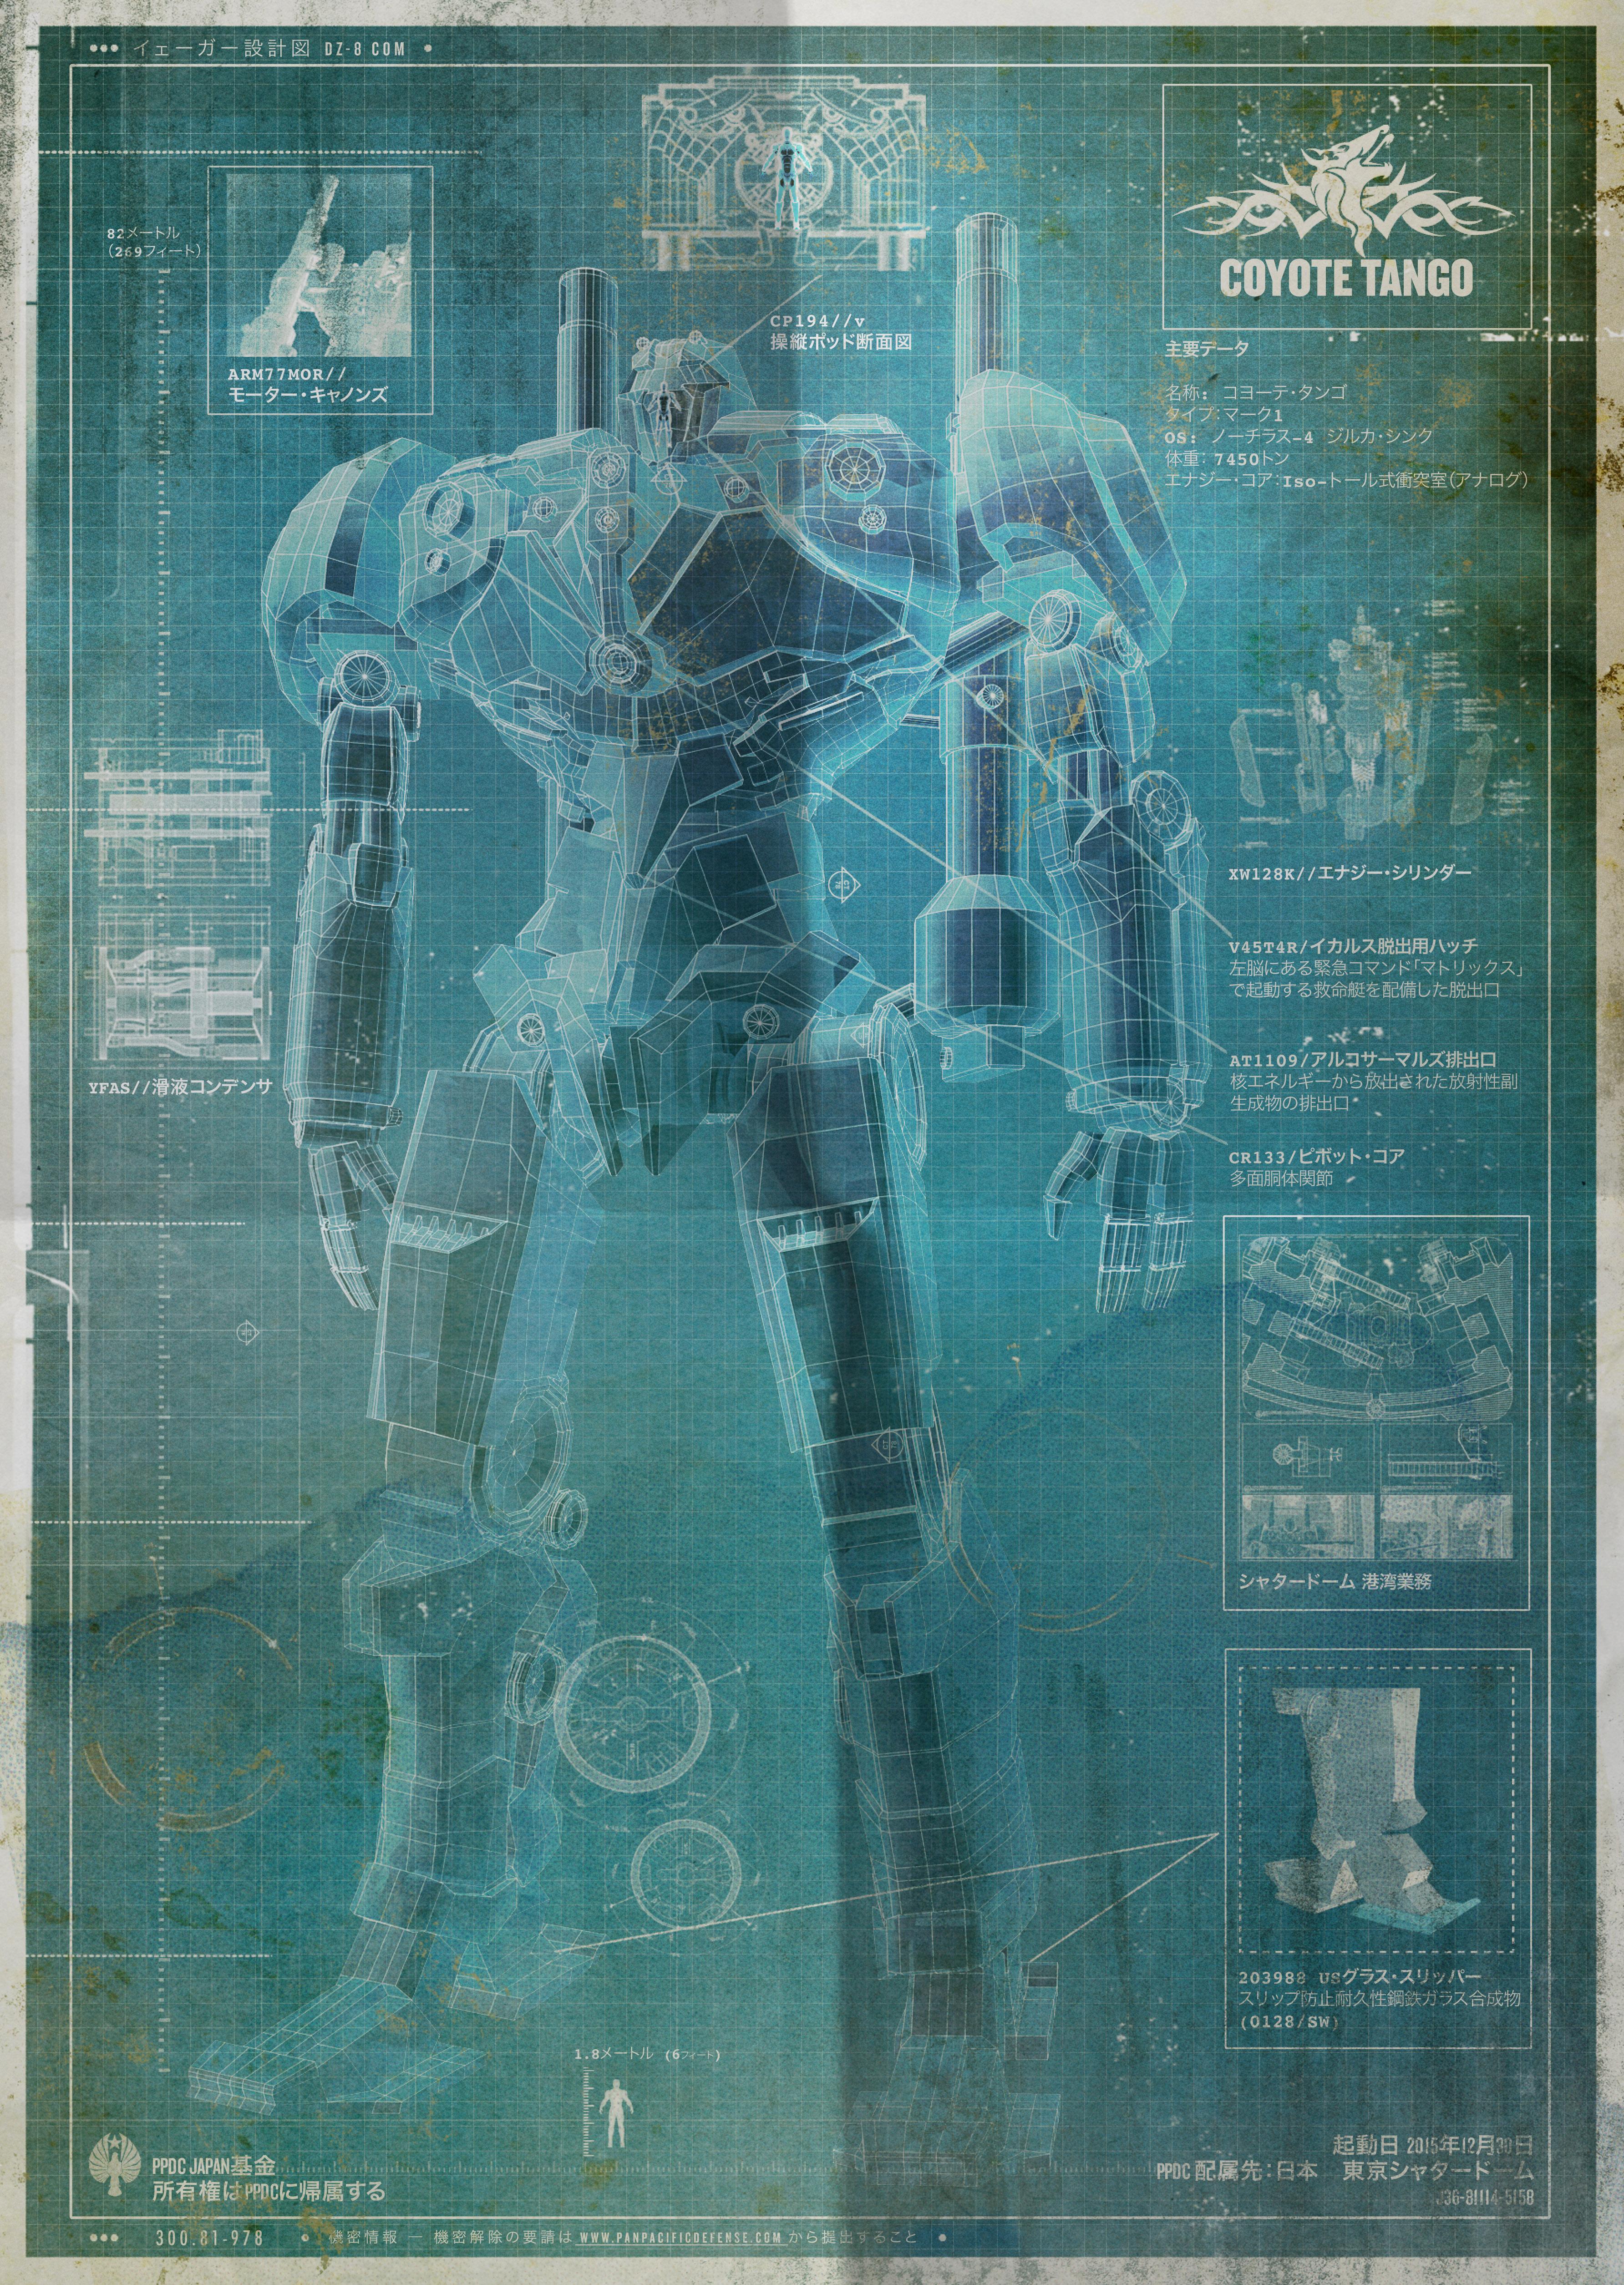 All-New Posters for Guillermo del Toro's Upcoming Sci-Fi ... Pacific Rim Blueprints